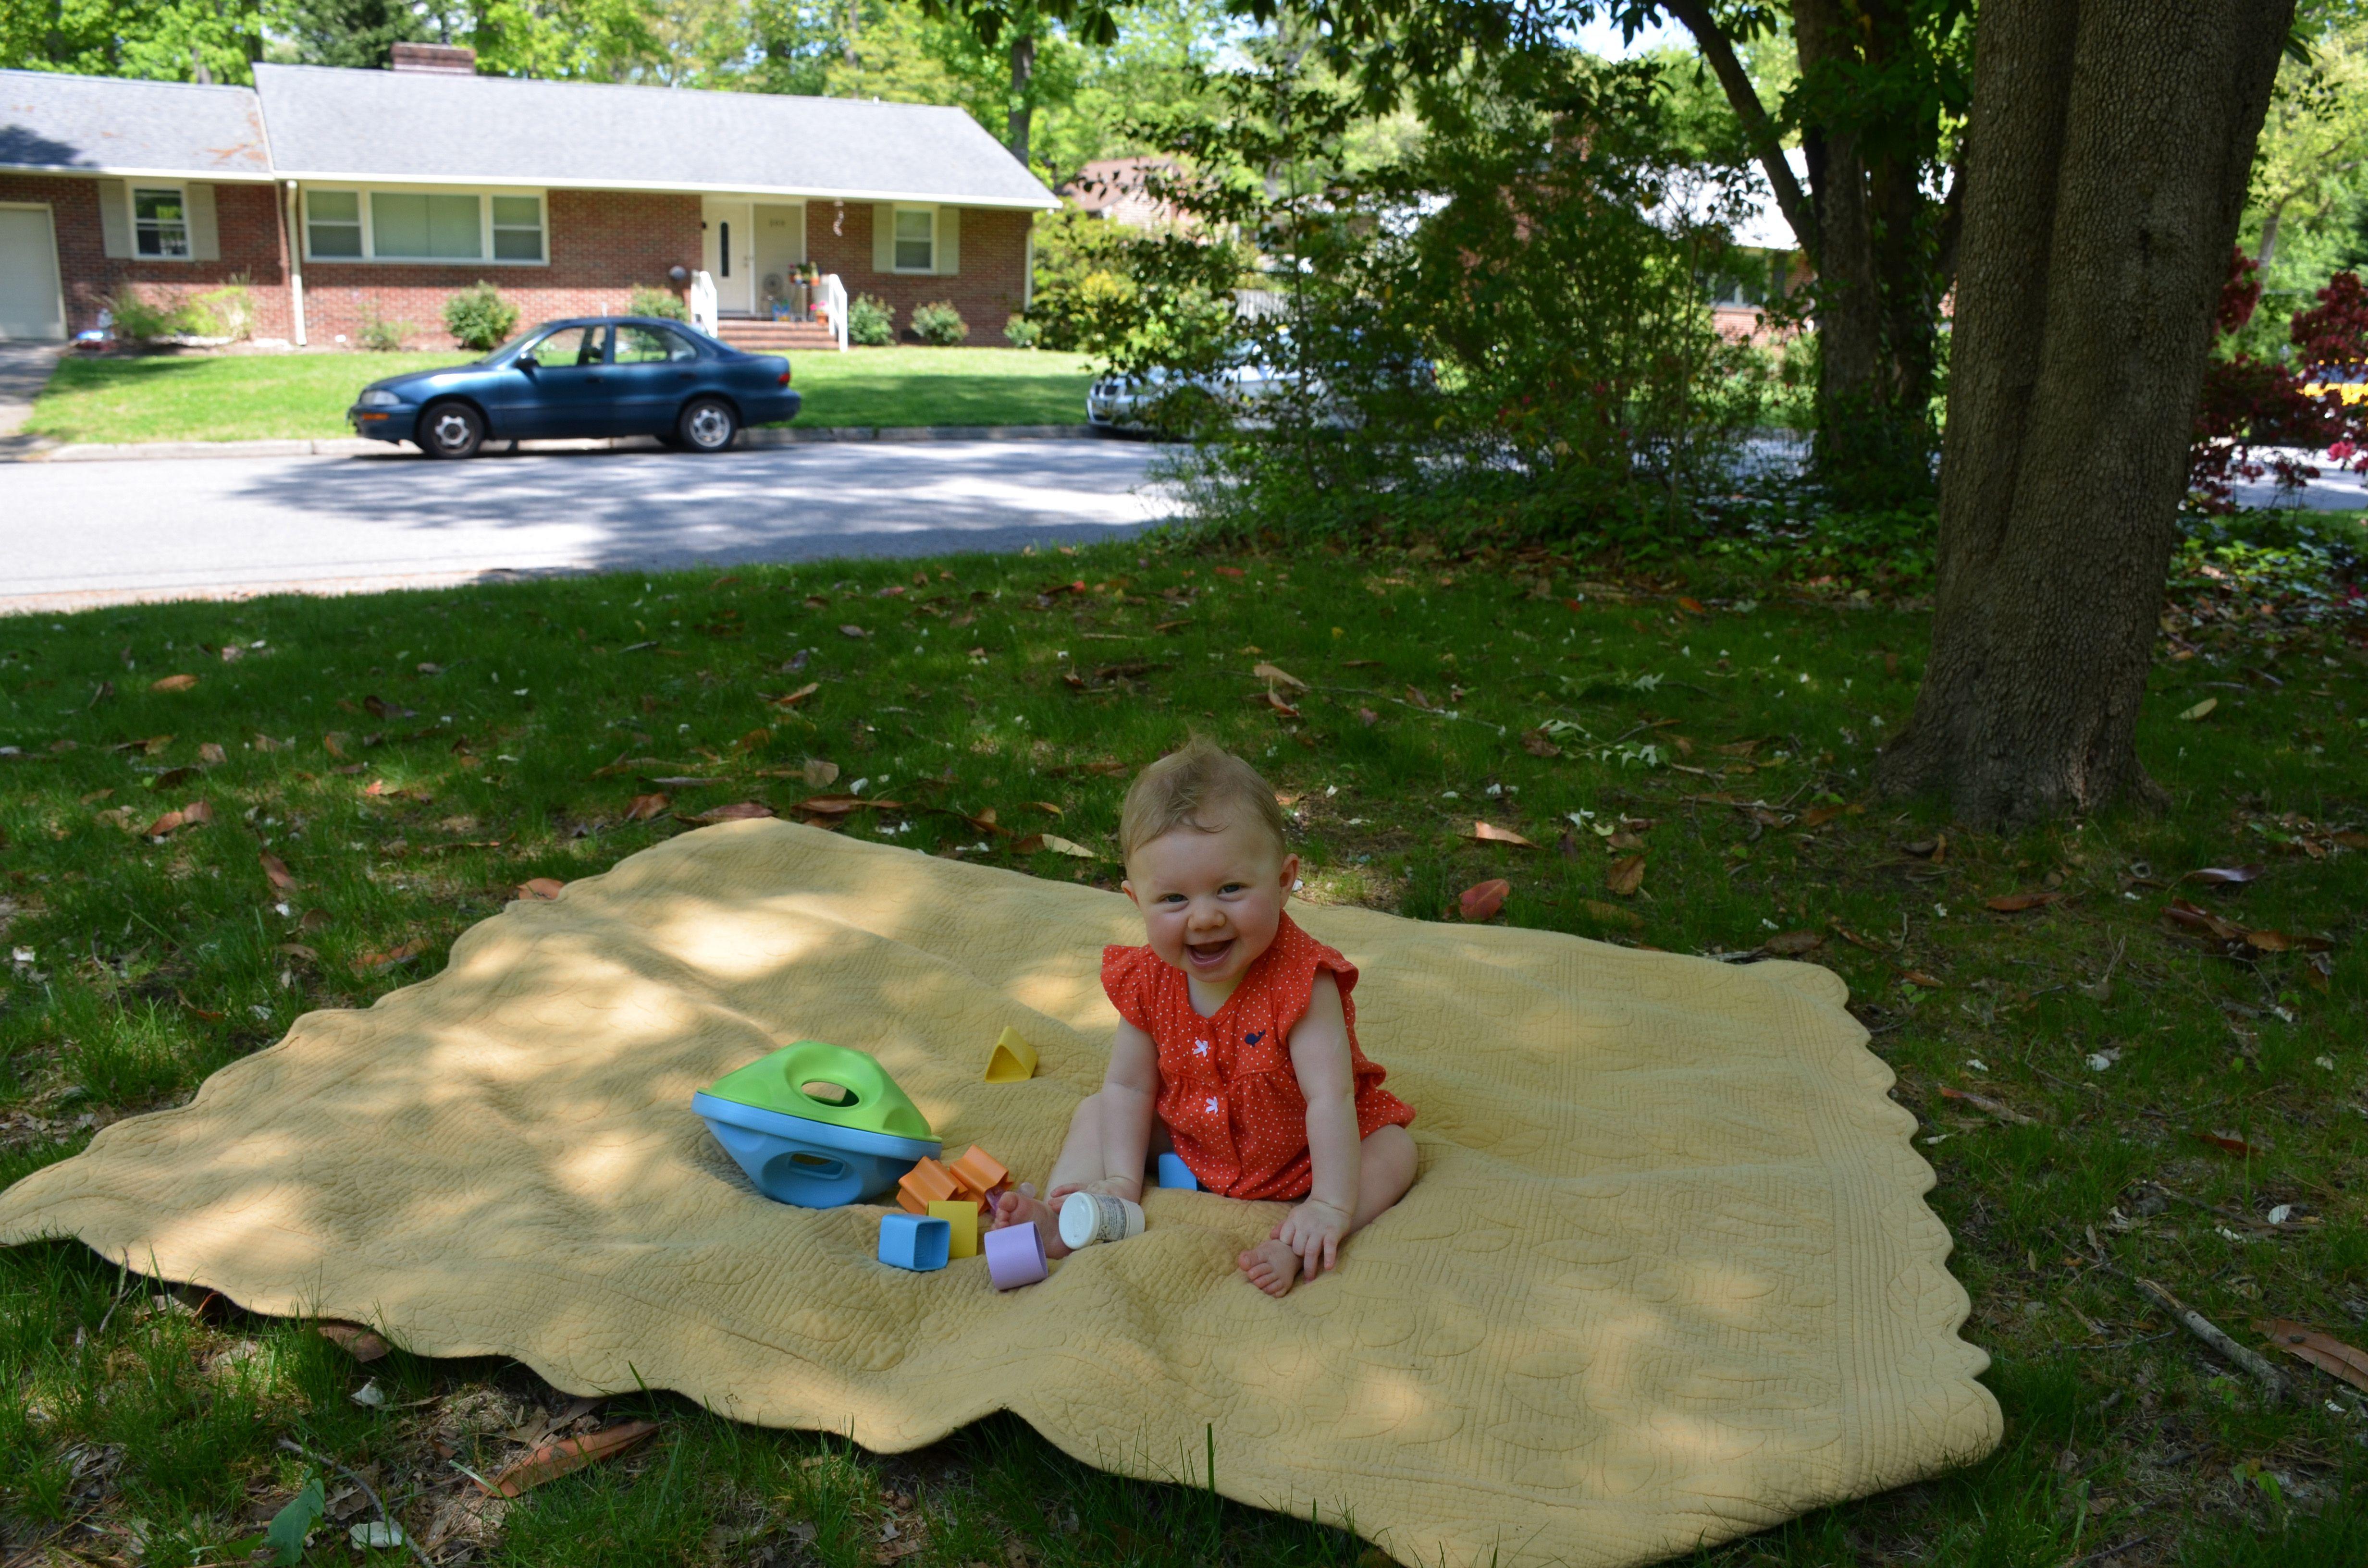 Idee Fotografiche Per Bambini : Pin di beth weinstein su baby and toddler photo ideas pinterest